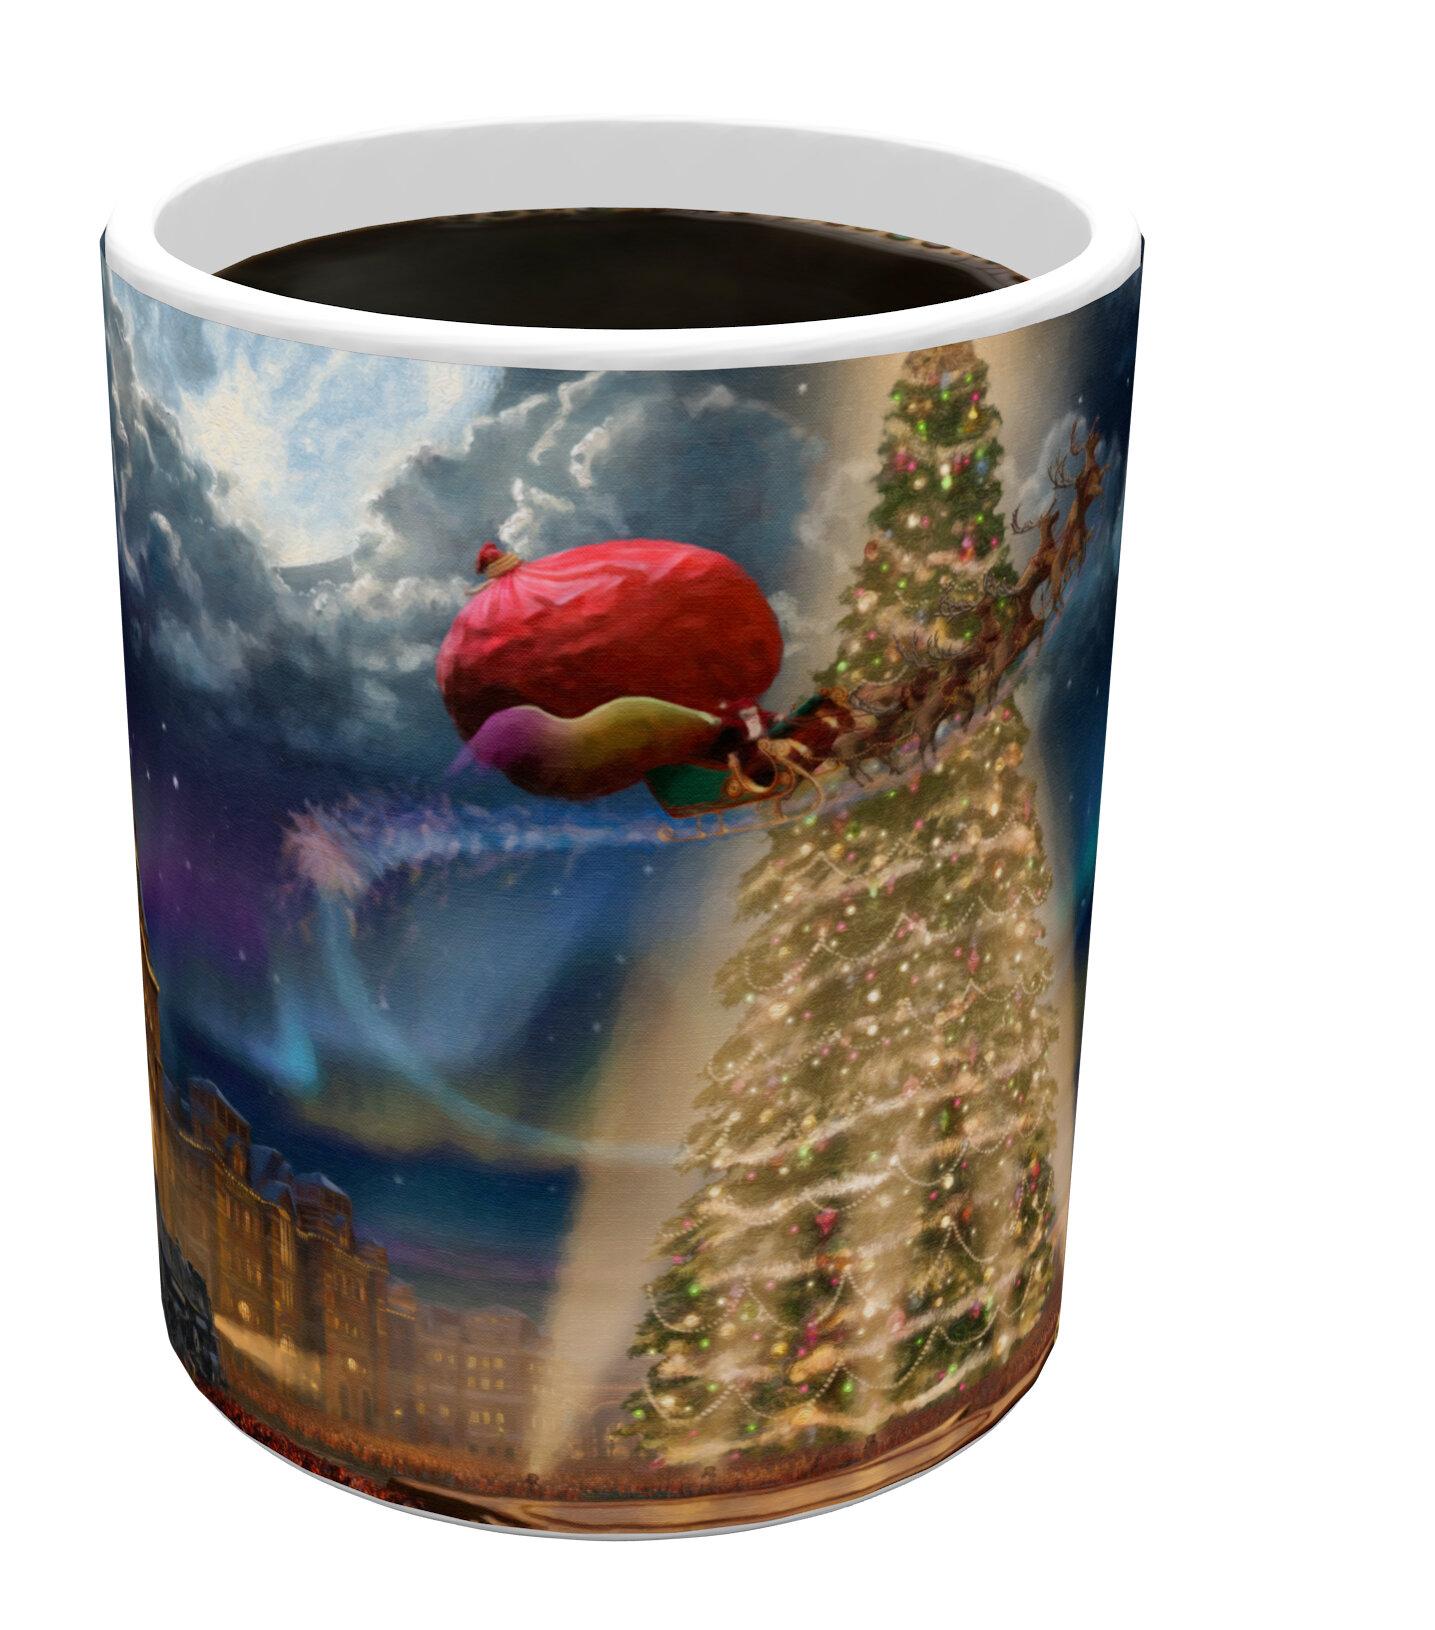 Morphing Mugs Thomas Kinkade (The Polar Express) Heat-Sensitive Mug   Wayfair